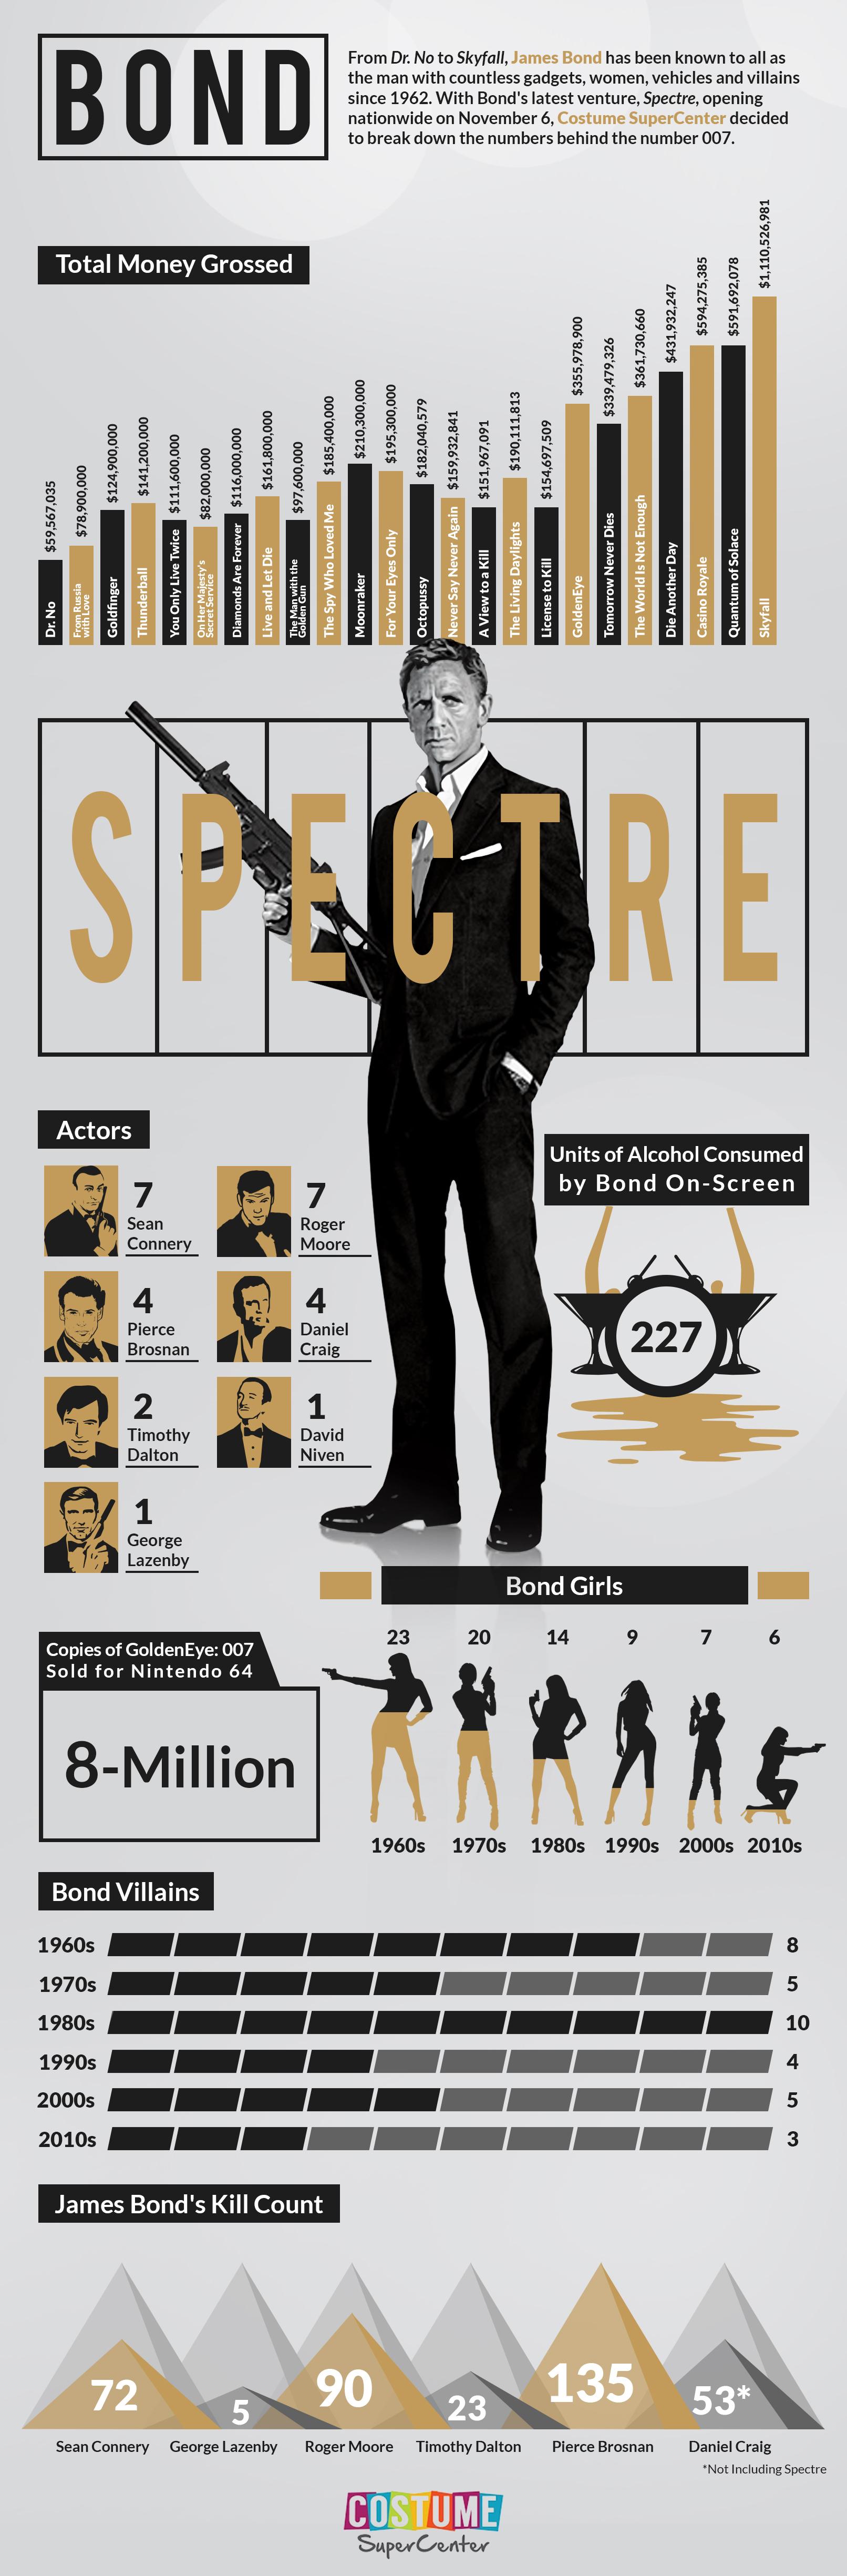 Bond-Spectre-infographic-rsz